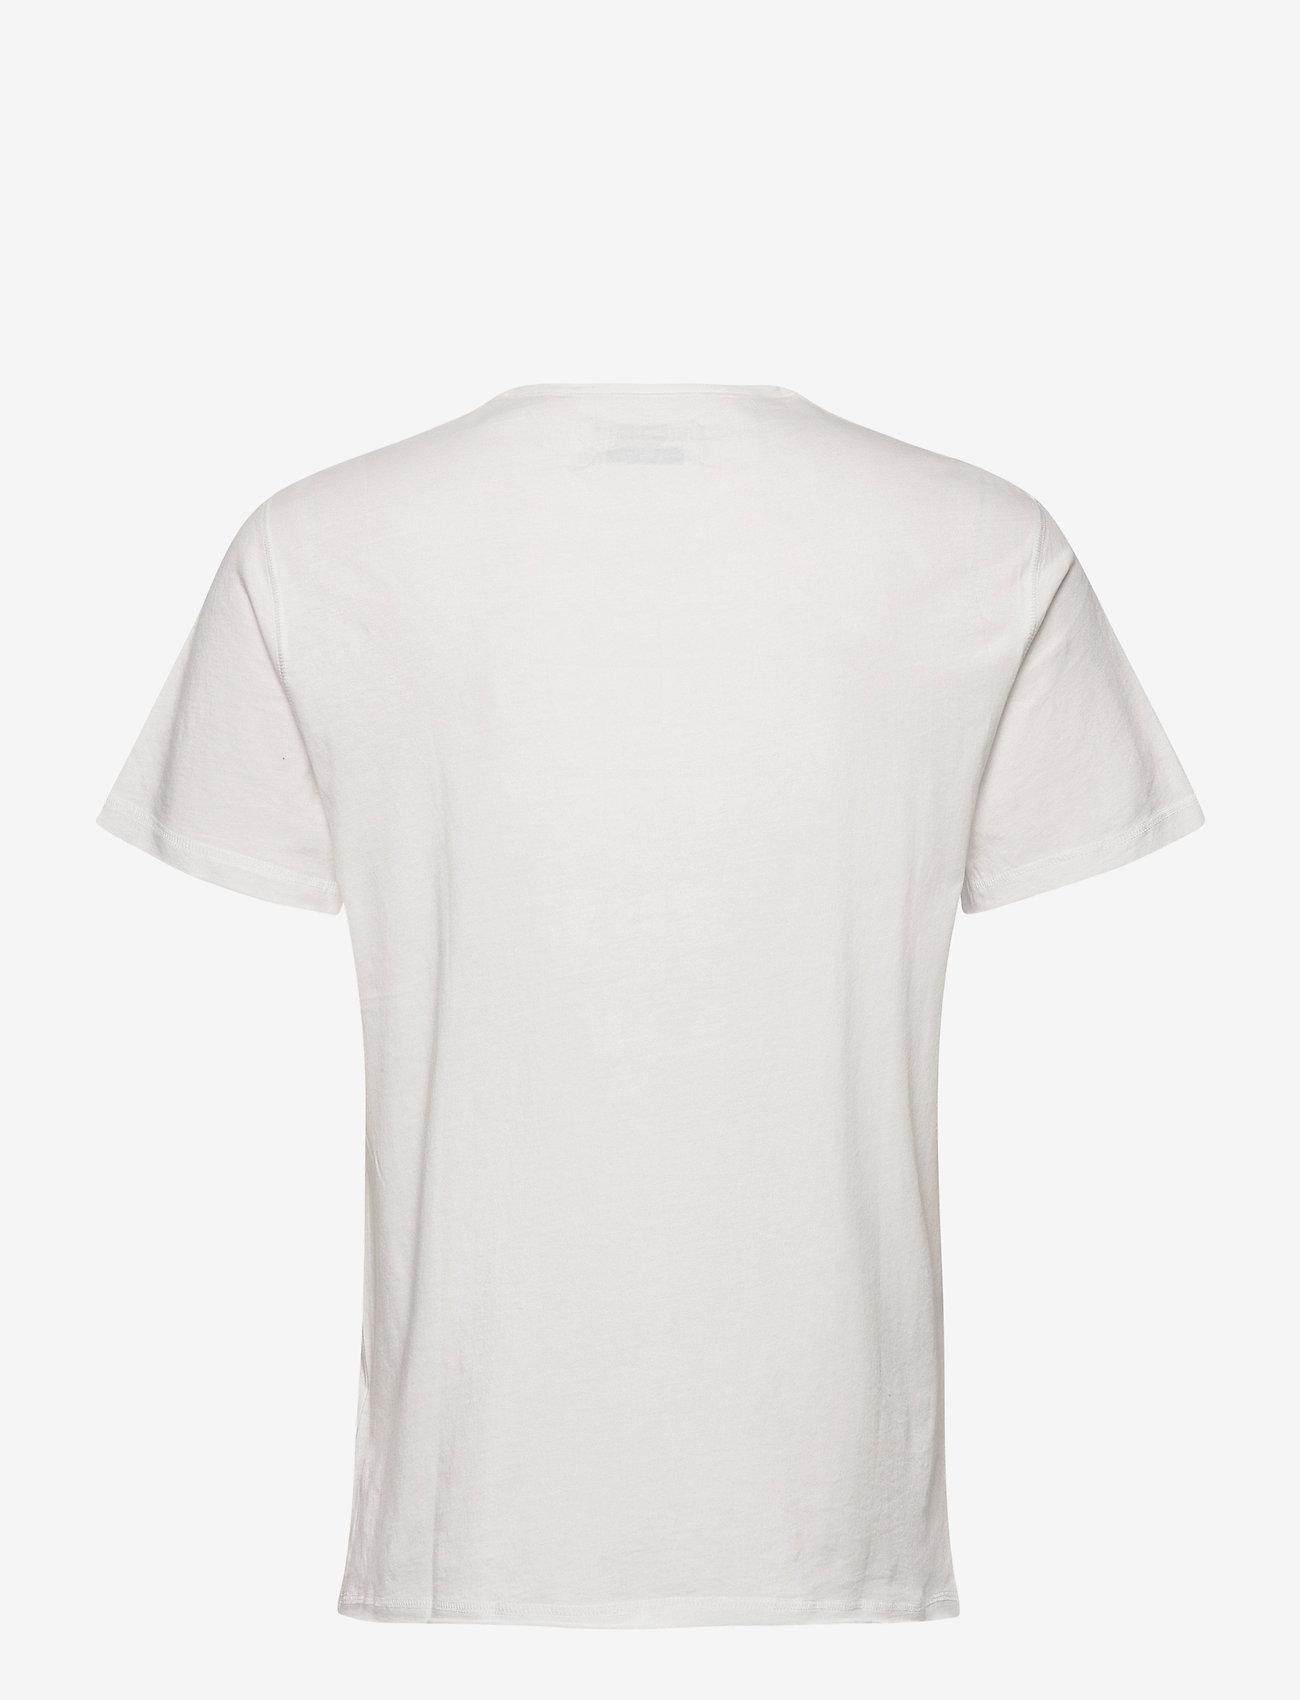 Zadig & Voltaire - MONASTIR MC ECO TUNISIEN MC ECOFRIENDLY - basic t-shirts - cream - 1